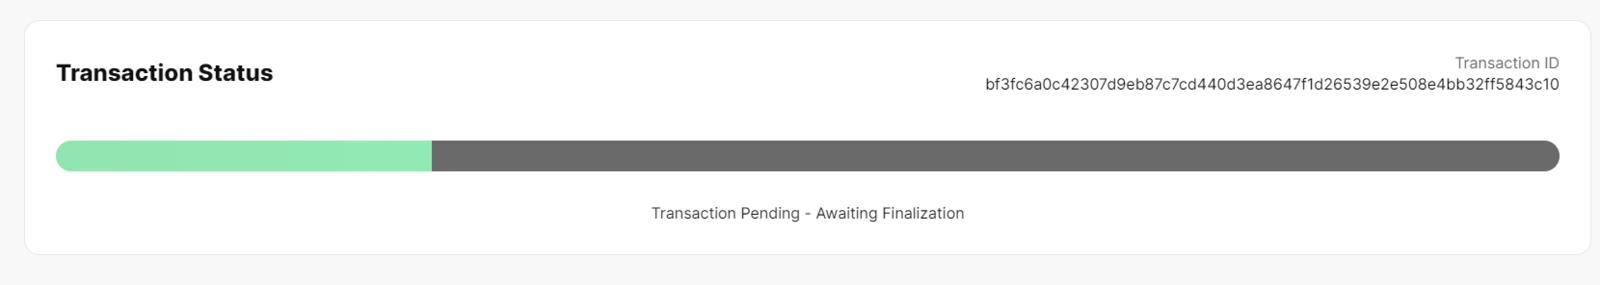 Processing transaction